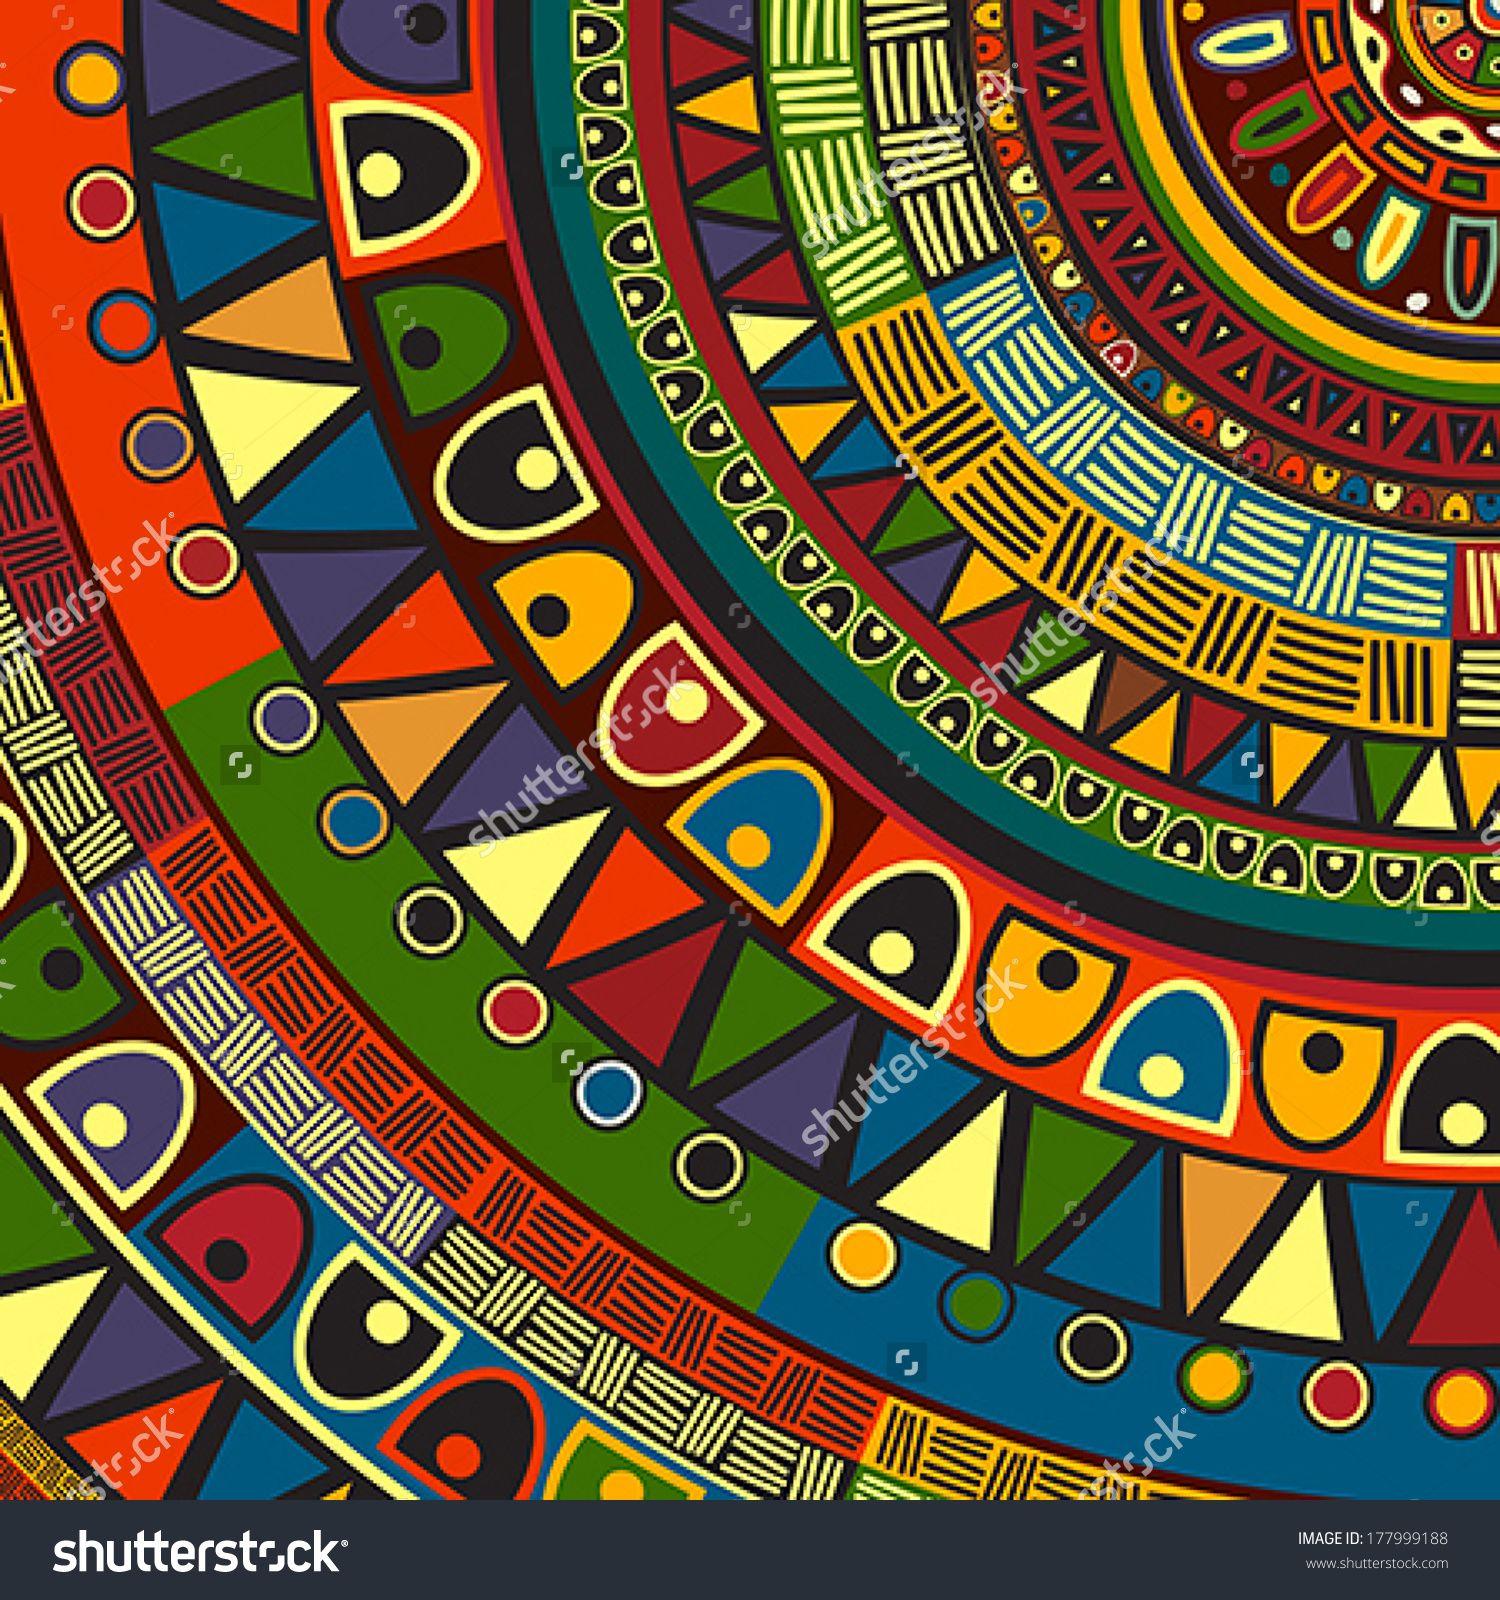 http://image.shutterstock.com/z/stock-vector-colored-tribal-design-abstract-art-177999188.jpg